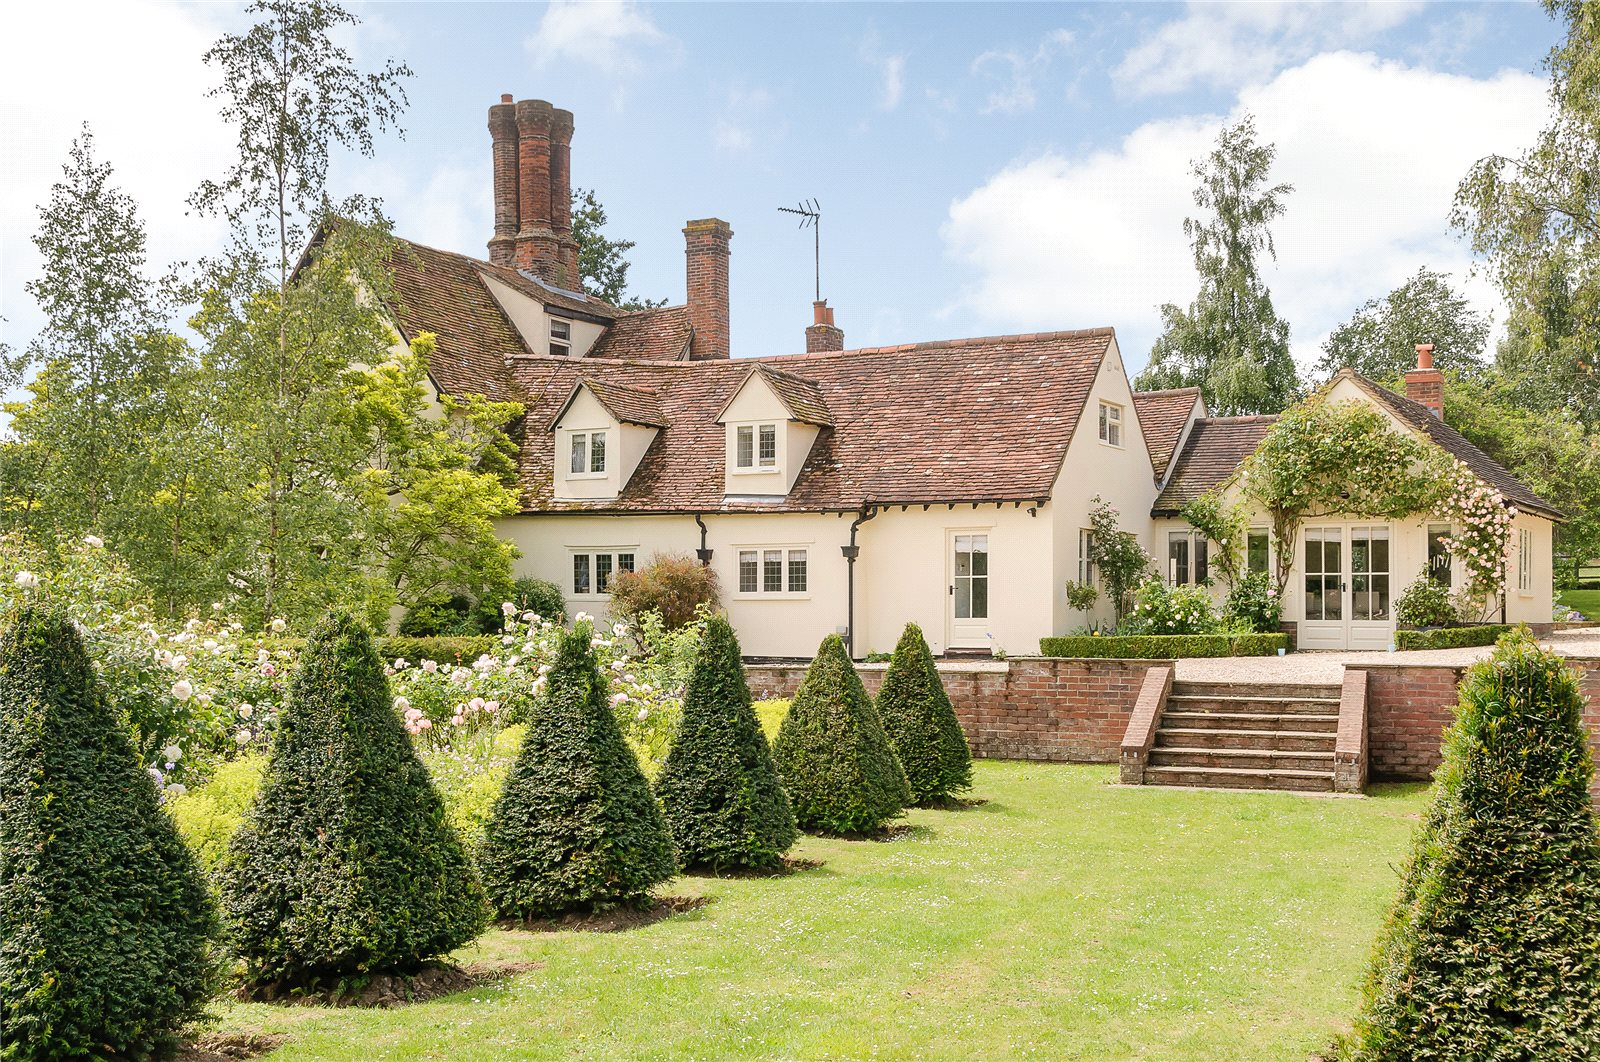 Single Family Home for Sale at Church Hill, Hempstead, Saffron Walden, Essex, CB10 Saffron Walden, England